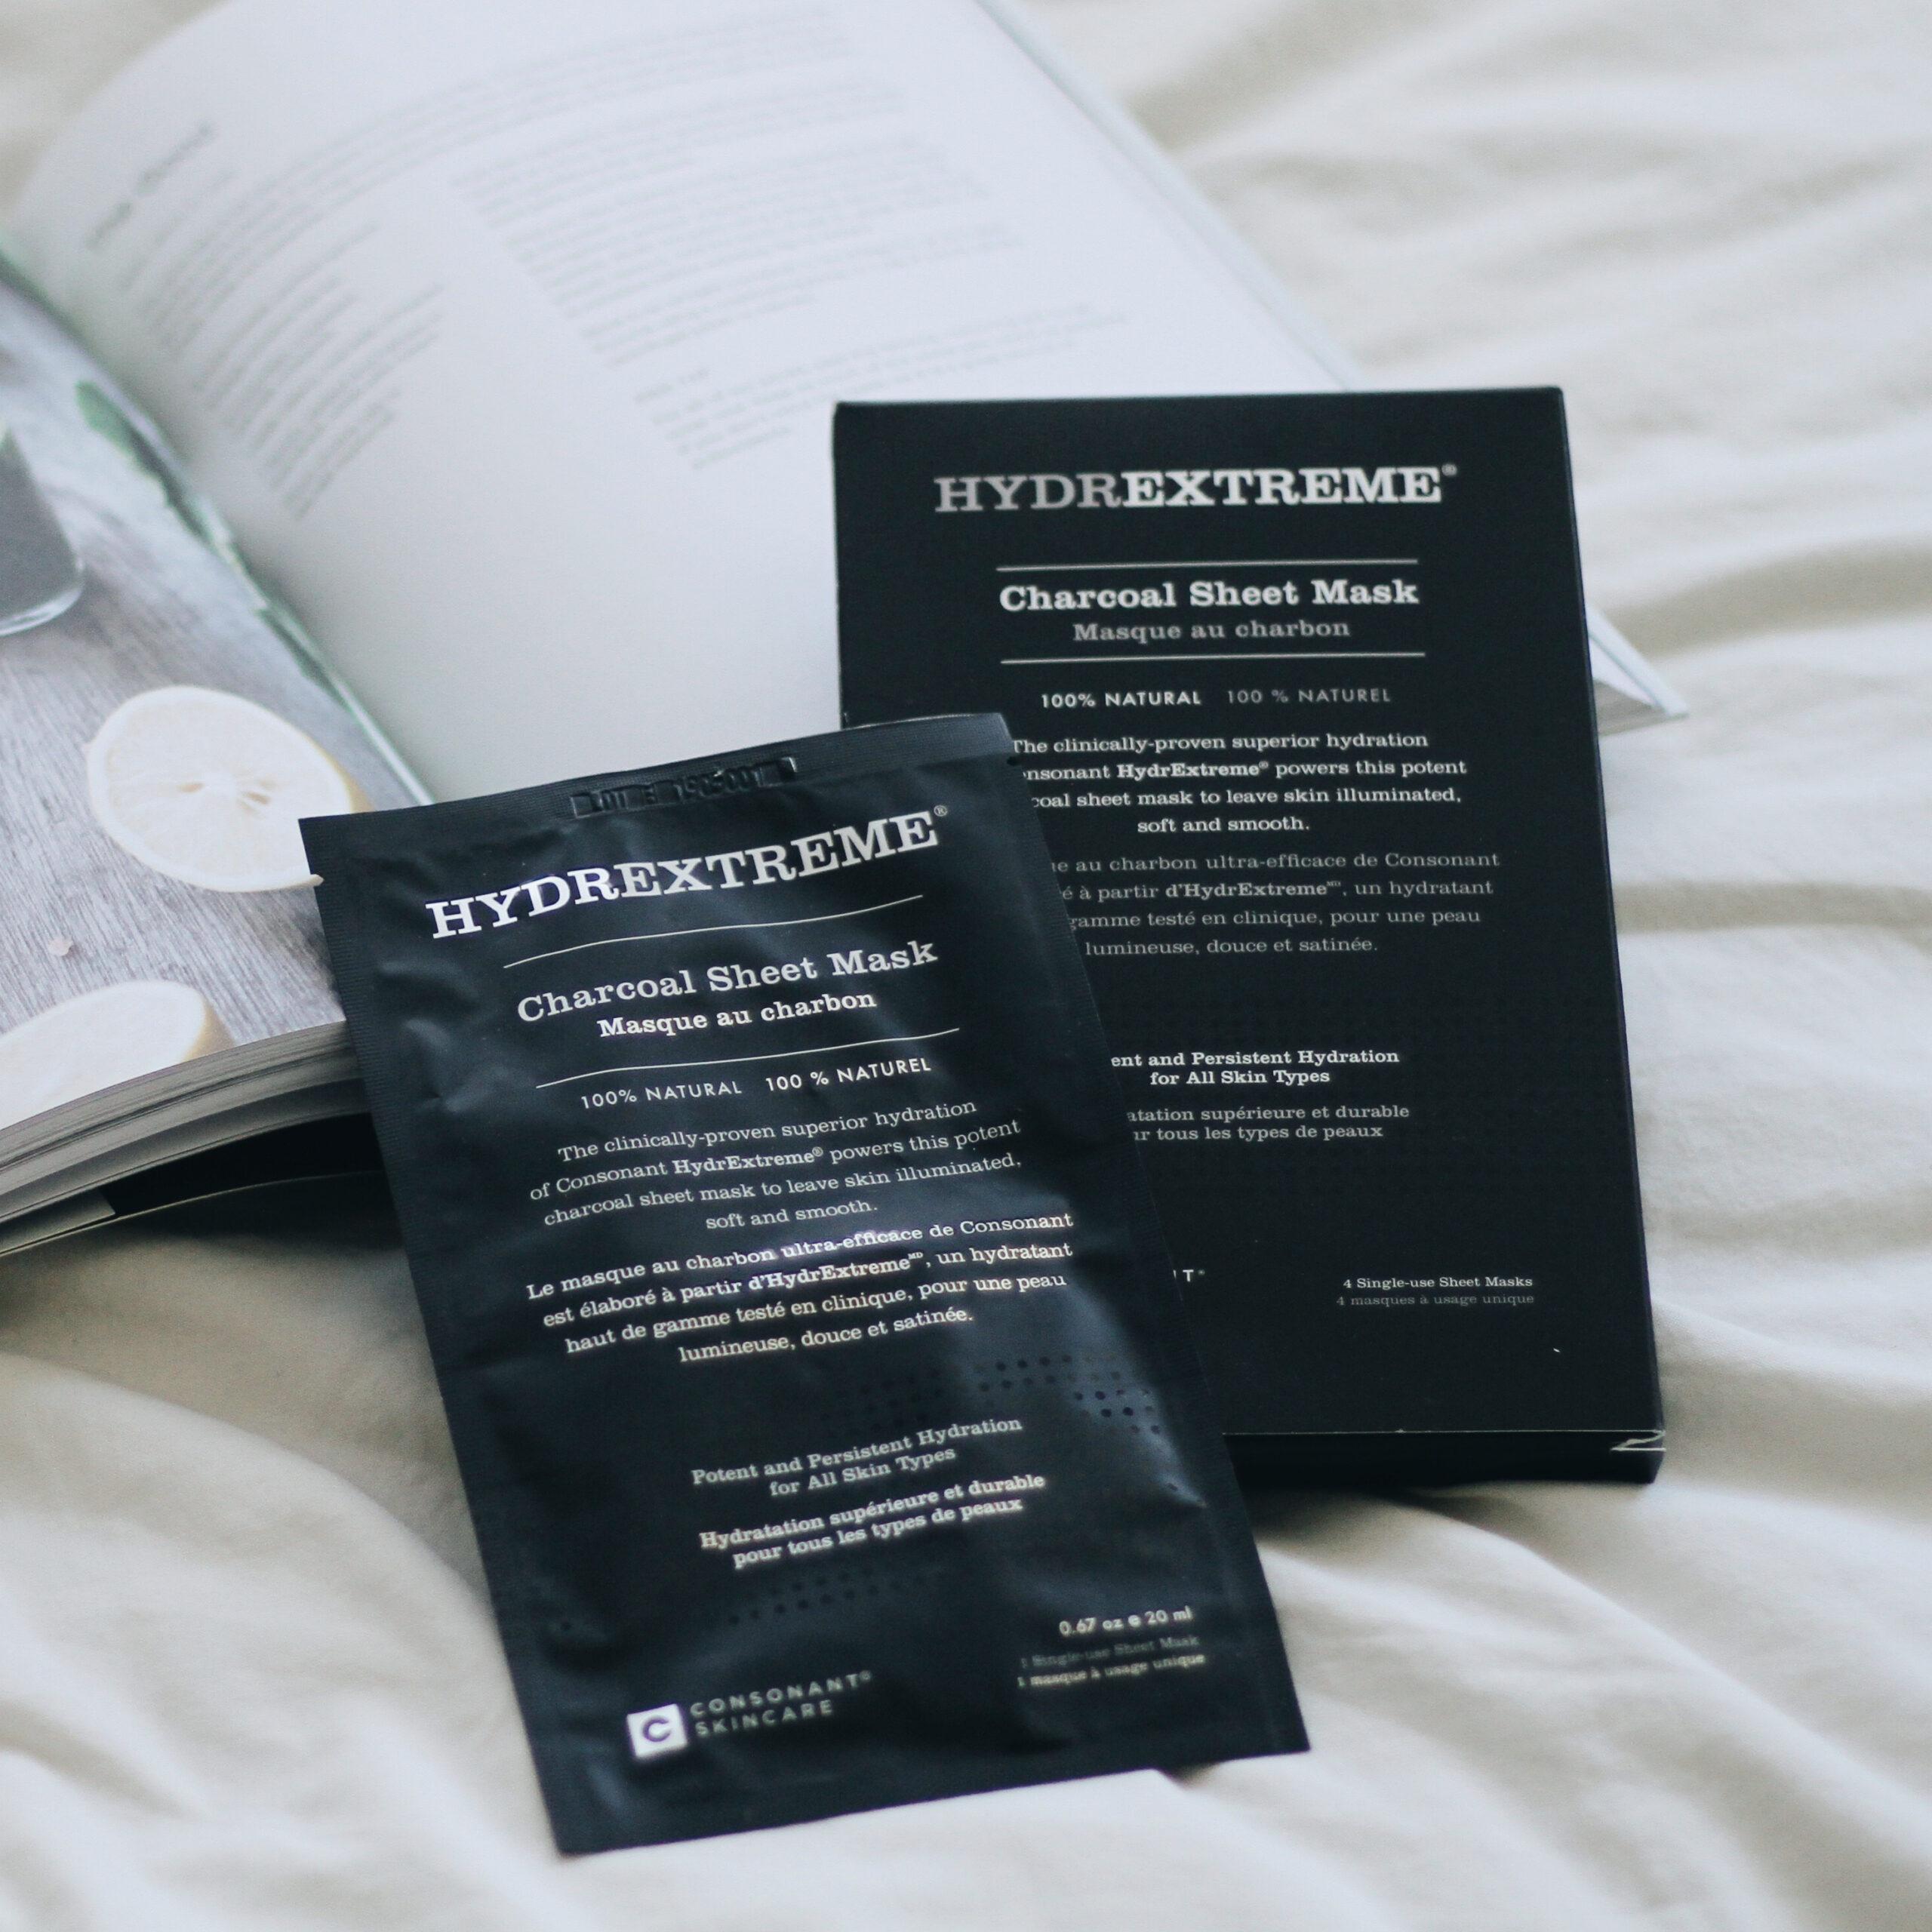 Consonant HydrExtreme 高效保濕竹炭面膜 (一片裝) $85